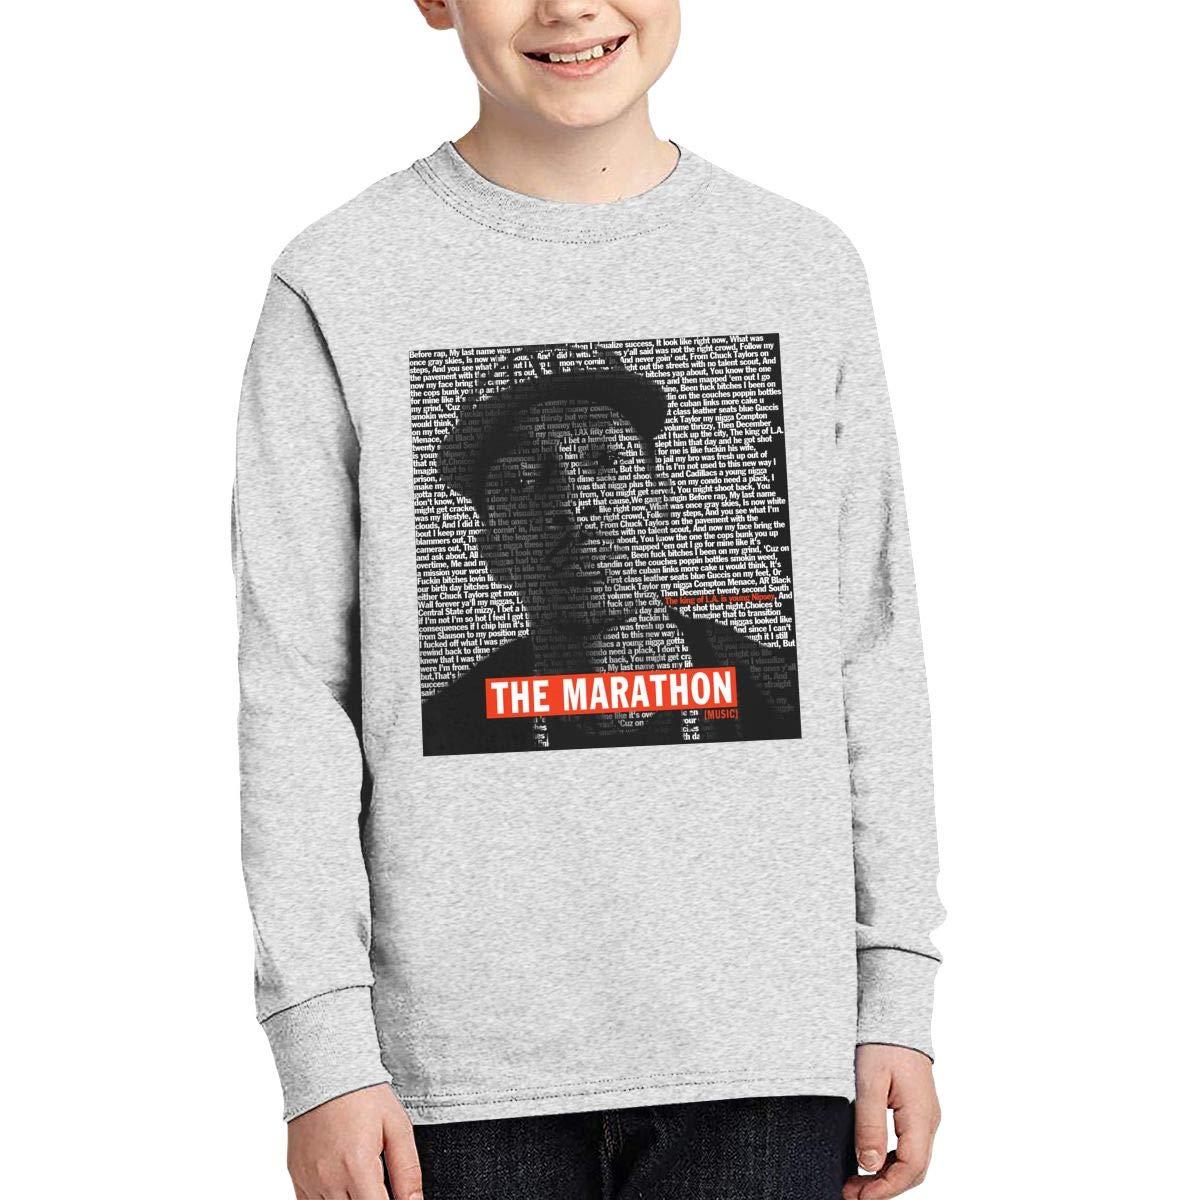 Play /& Games Teen Boys Girls Nipsey Hussle 11 Junior Long Sleeve T-Shirt Black